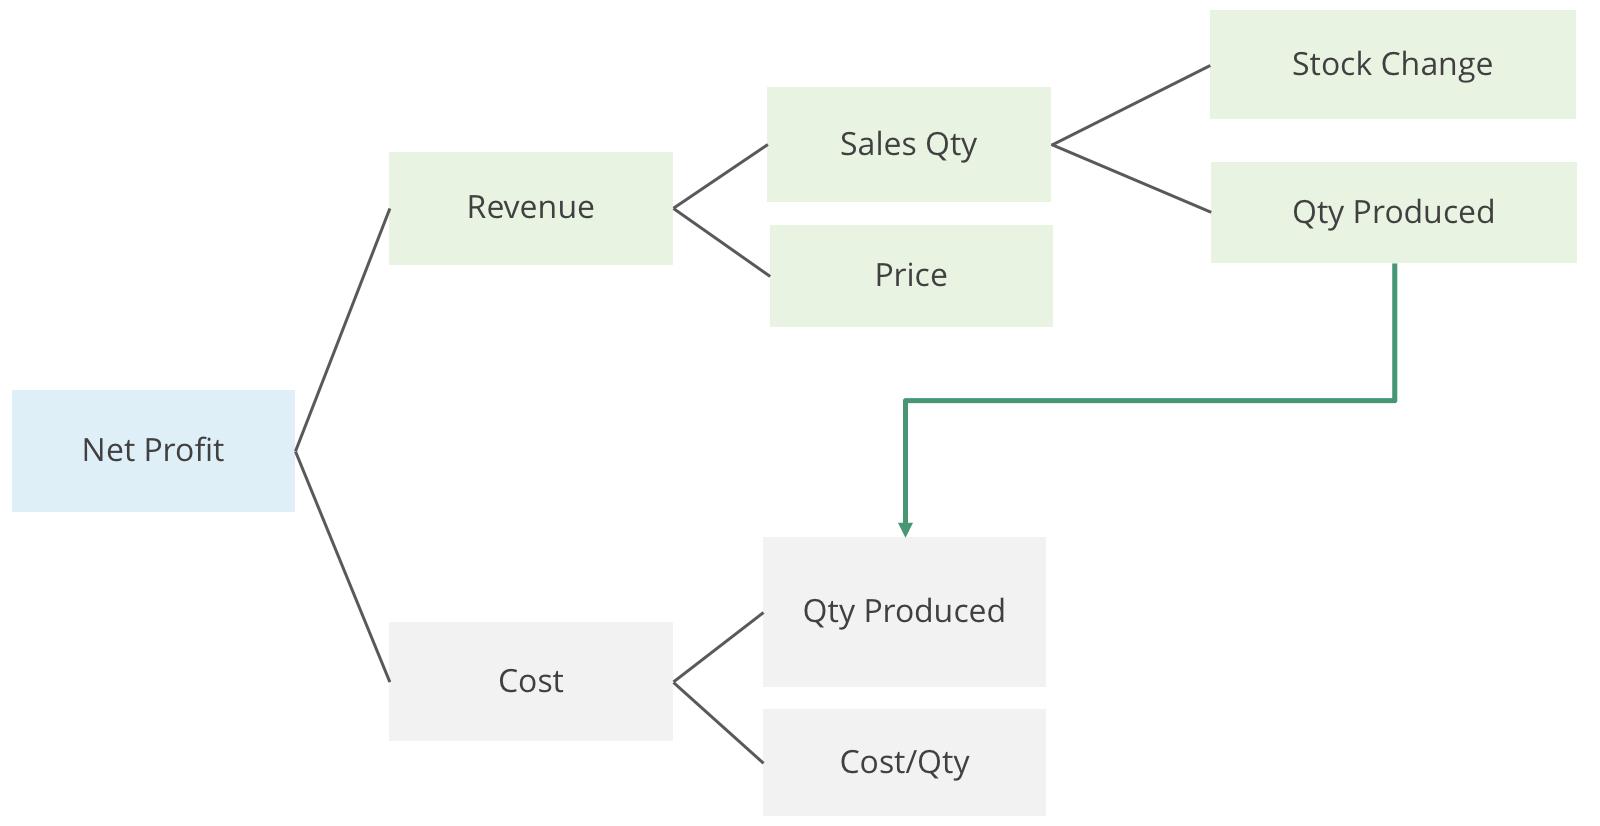 Value-Driver-Tree-Sample-Model